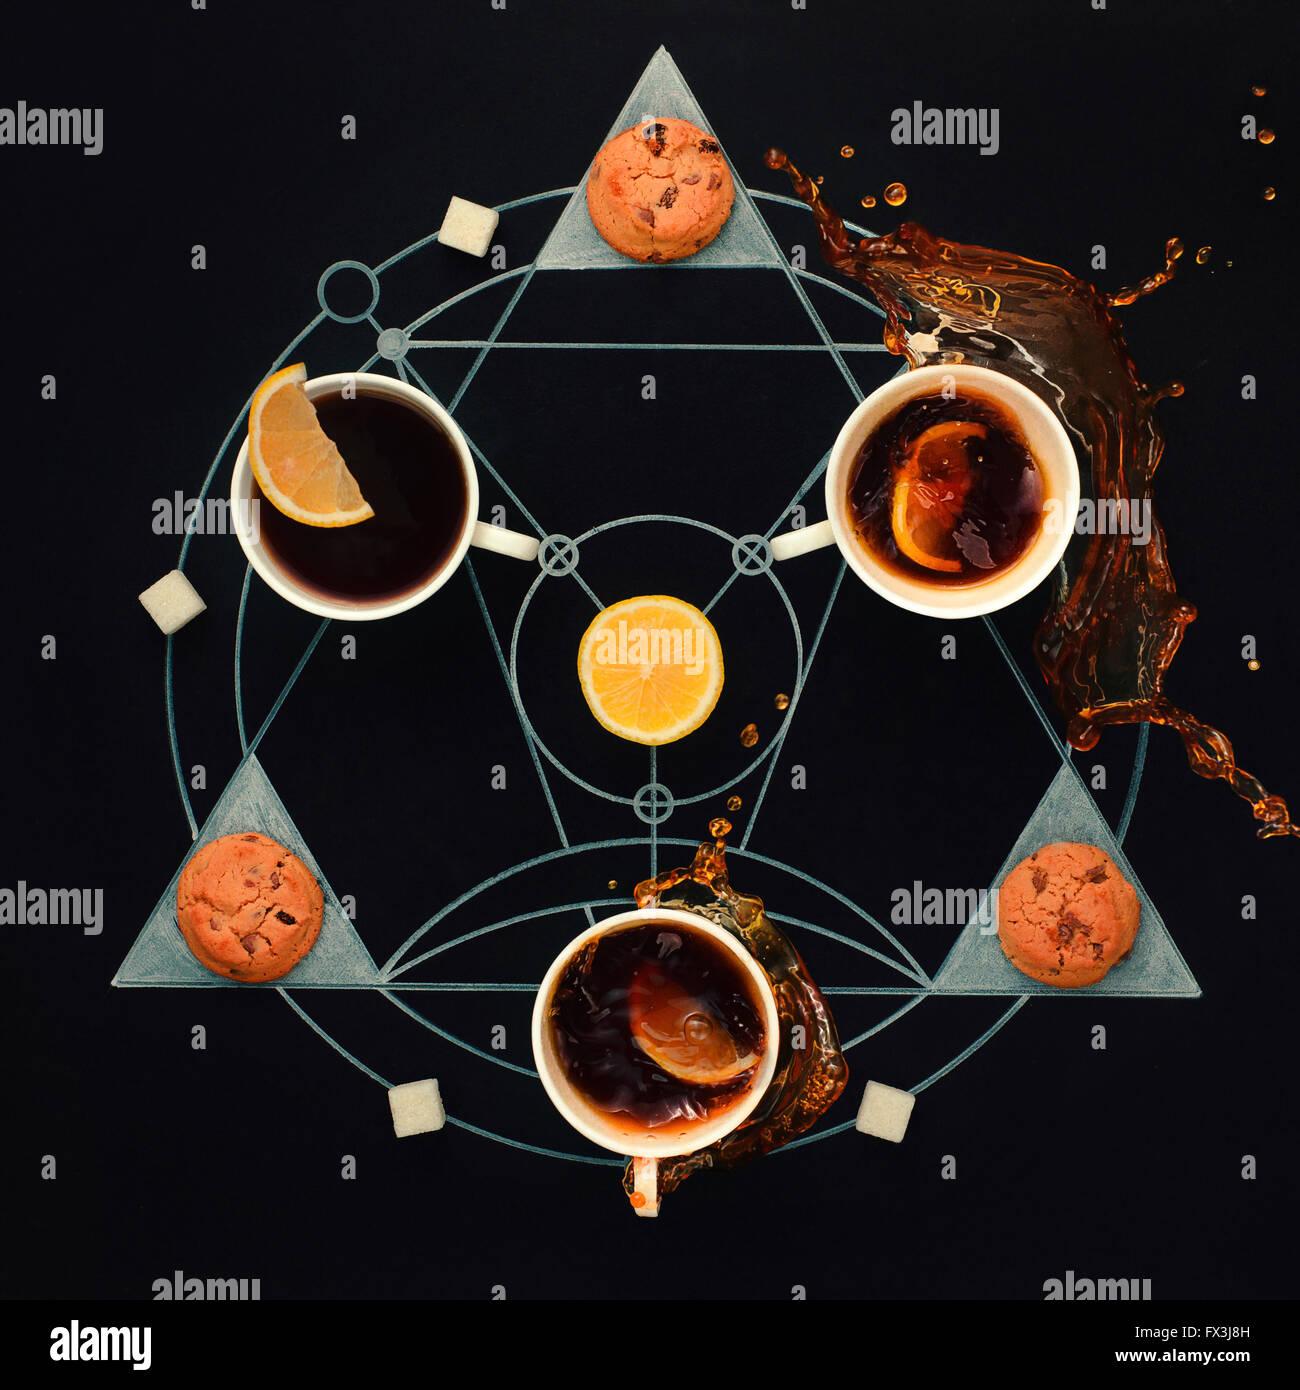 Teatime alchemy - Stock Image